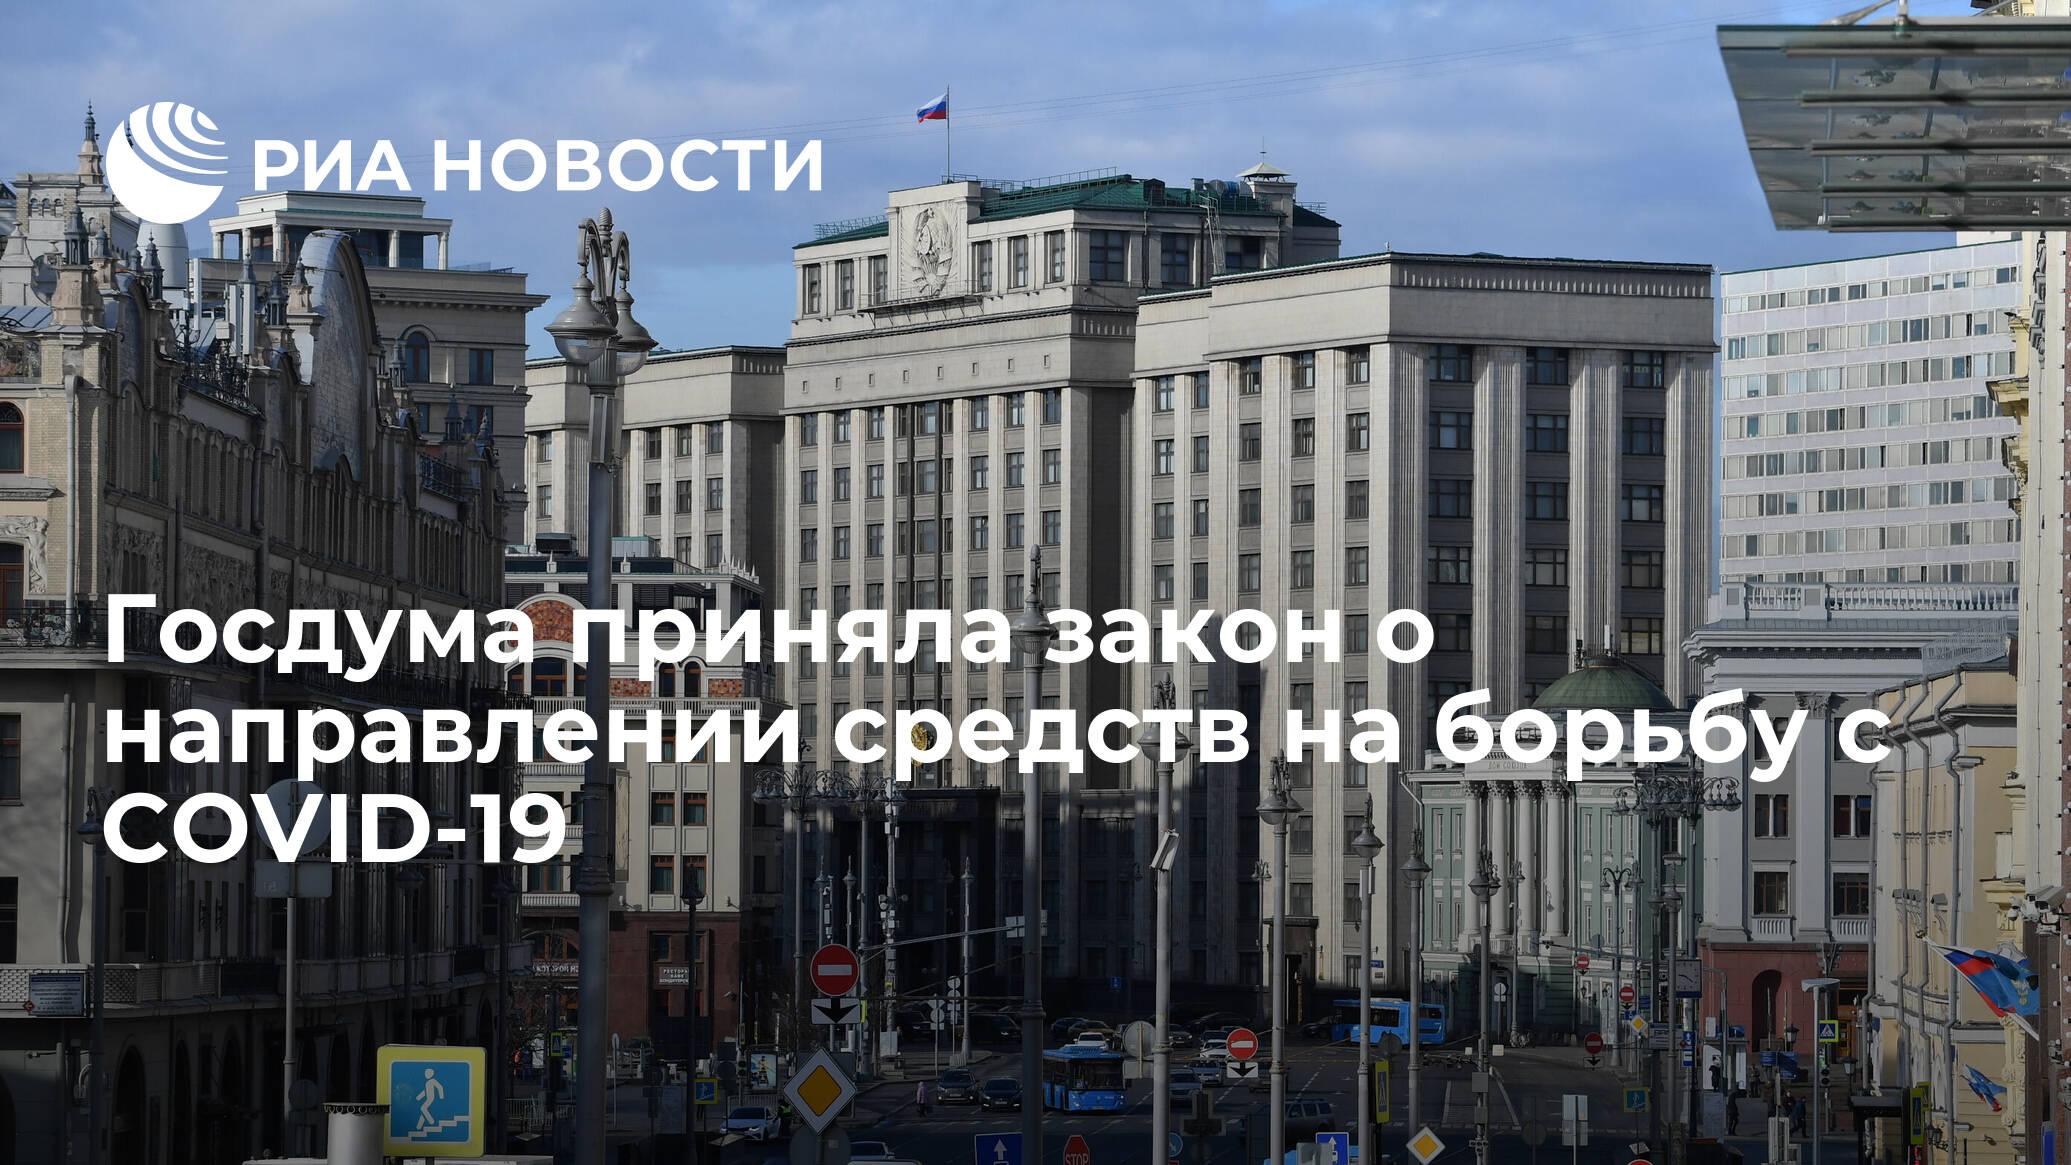 Госдума приняла закон о направлении средств на борьбу с COVID-19